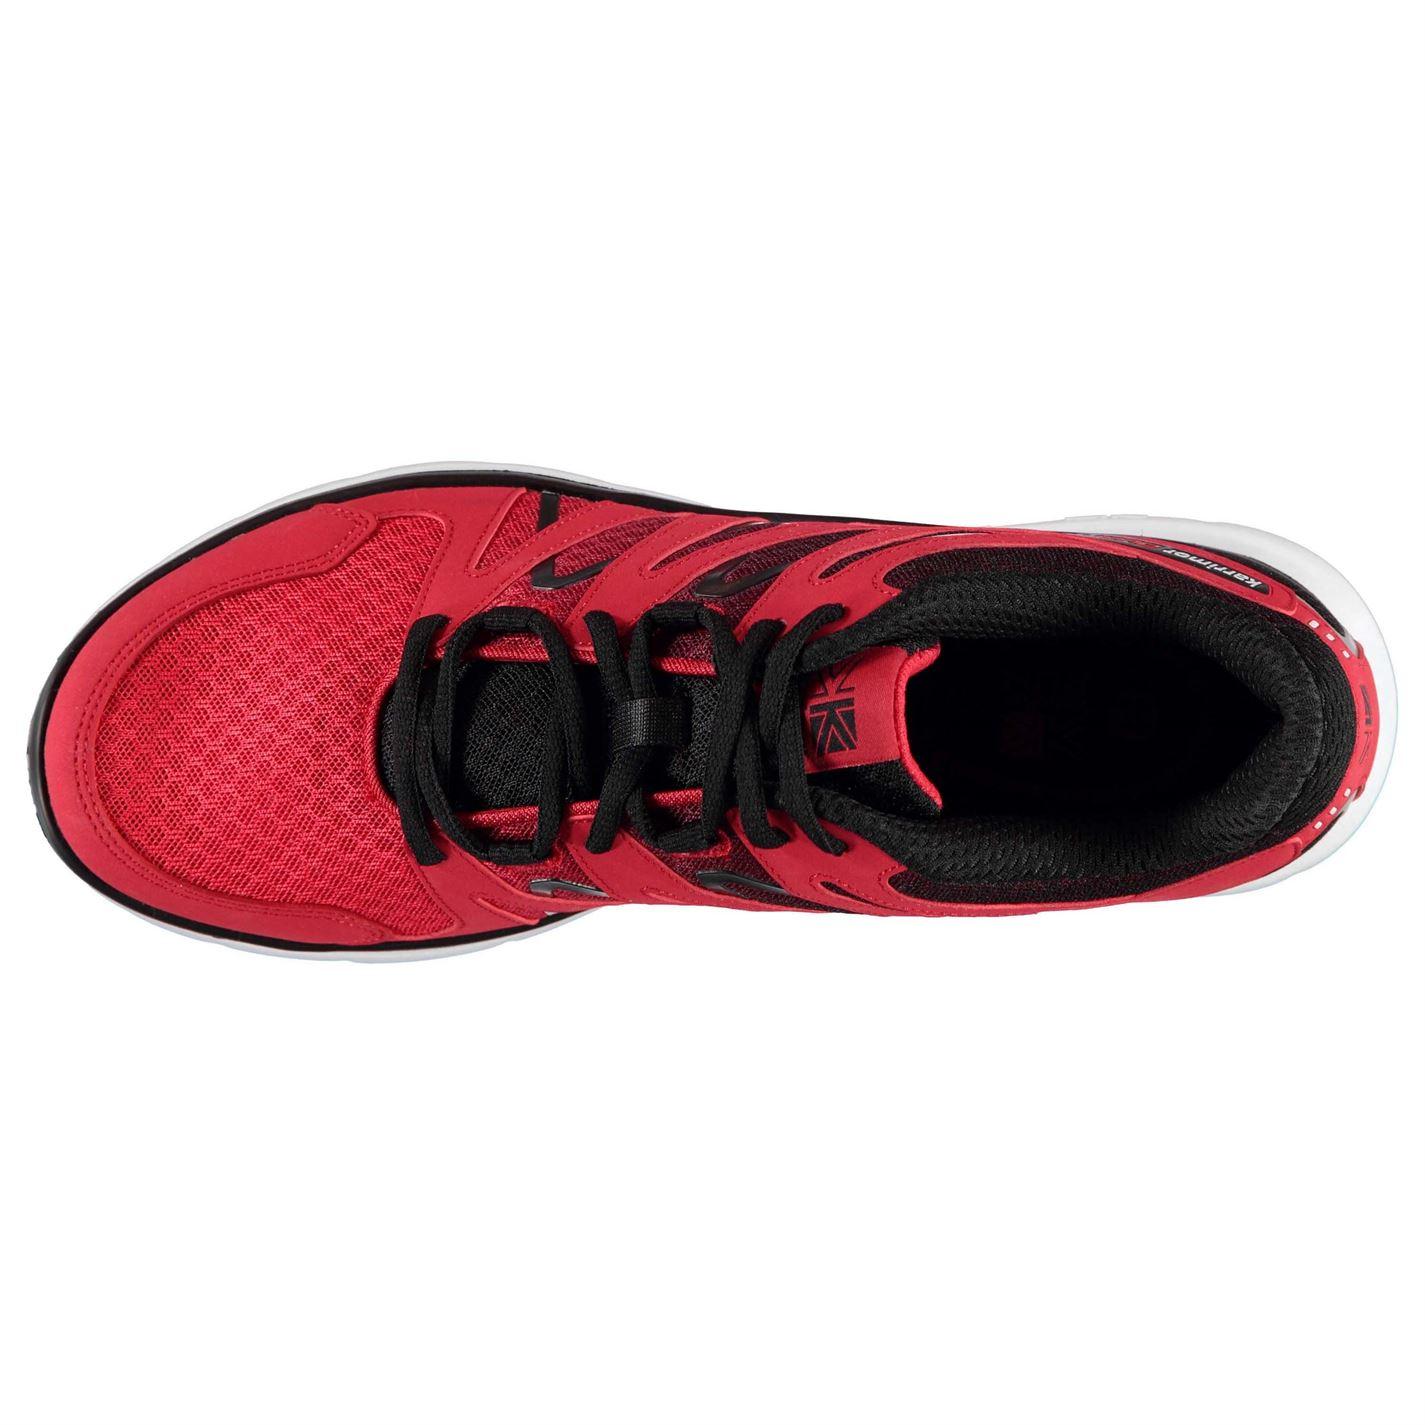 Karrimor-Mens-Duma-Trainers-Lace-Up-Sports-Running-Cross-Training-Shoes thumbnail 45